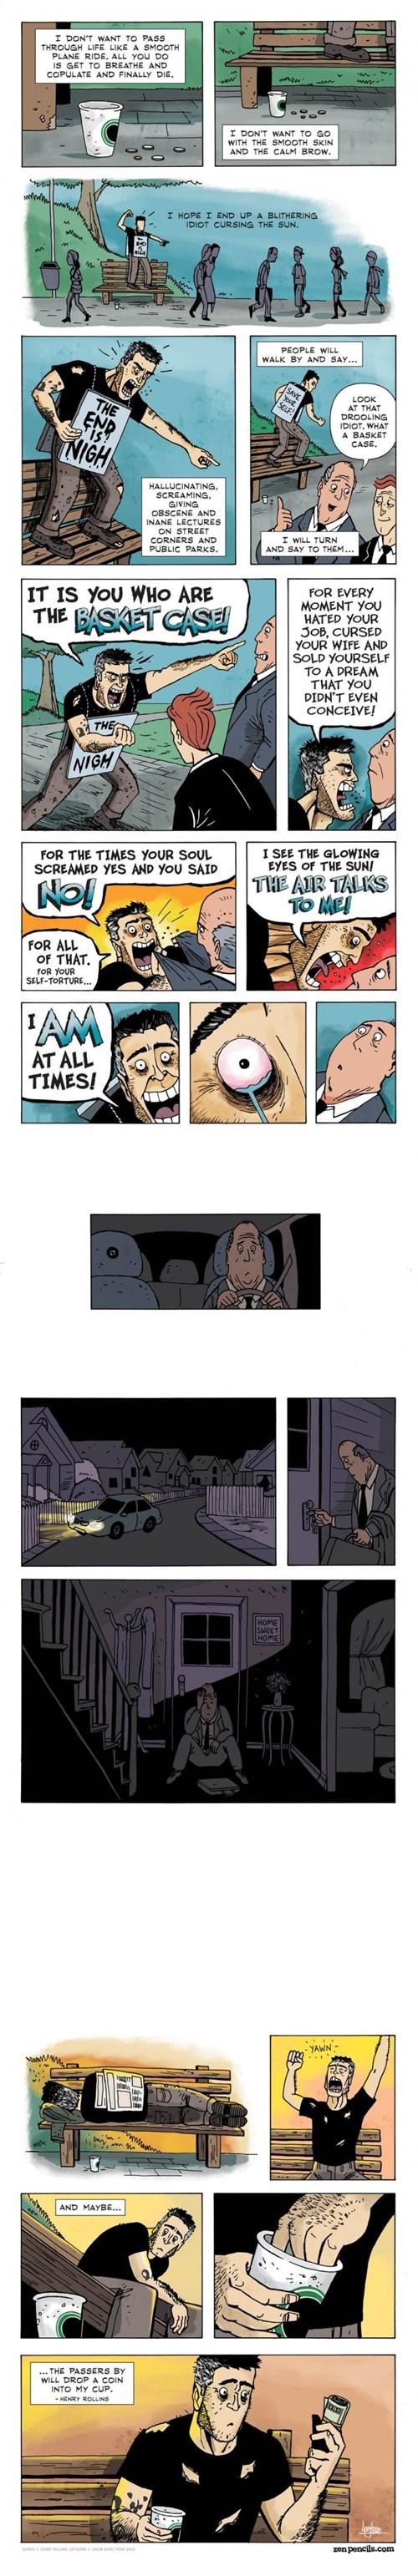 henry rollins sick truth web comics - 8255204096